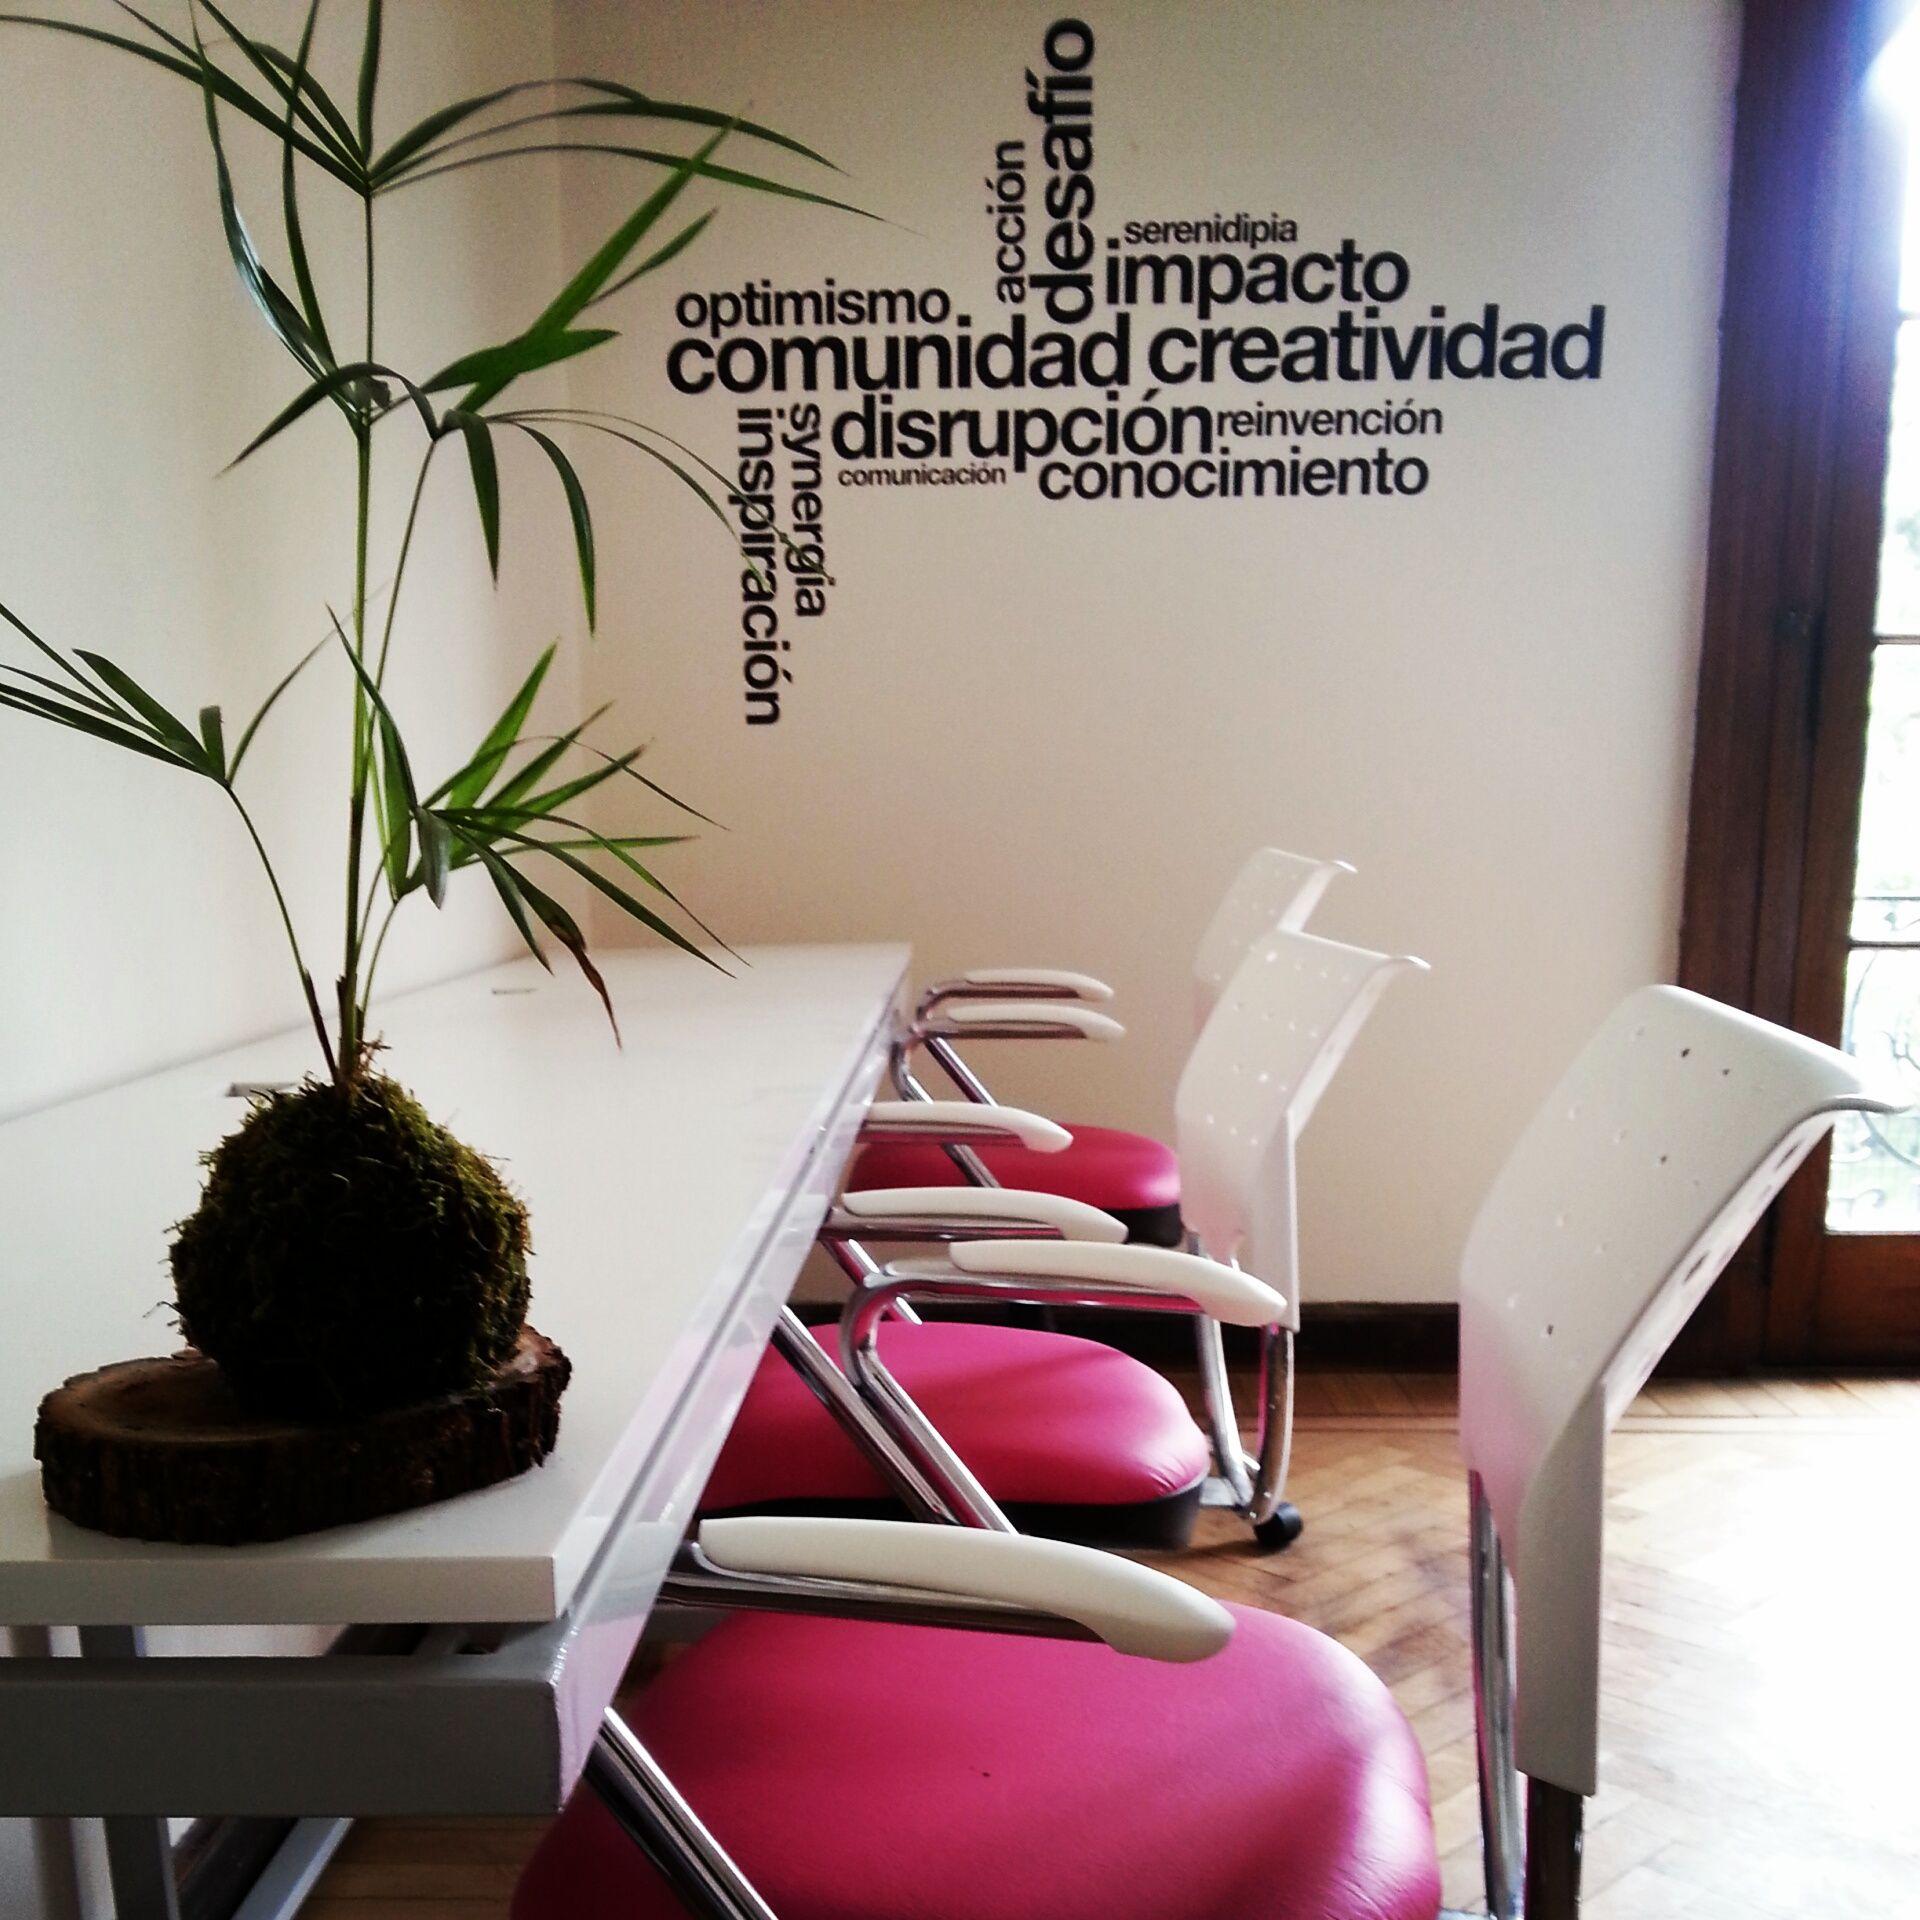 Decoracion creativa de oficina buscar con google for Decoracion de interiores oficinas